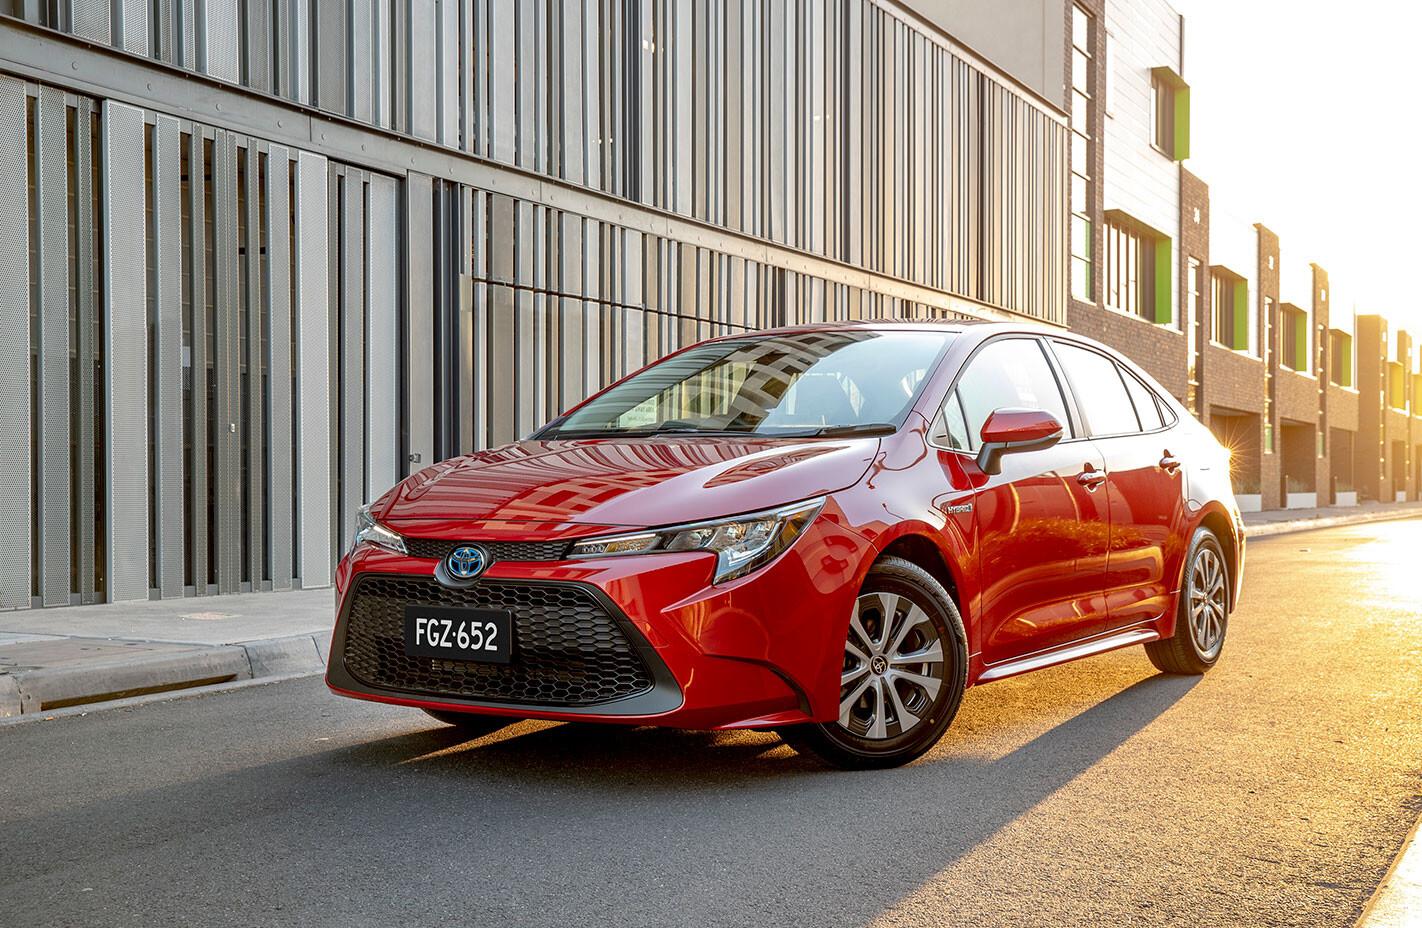 Toyota's Hybrid-Electric Technology